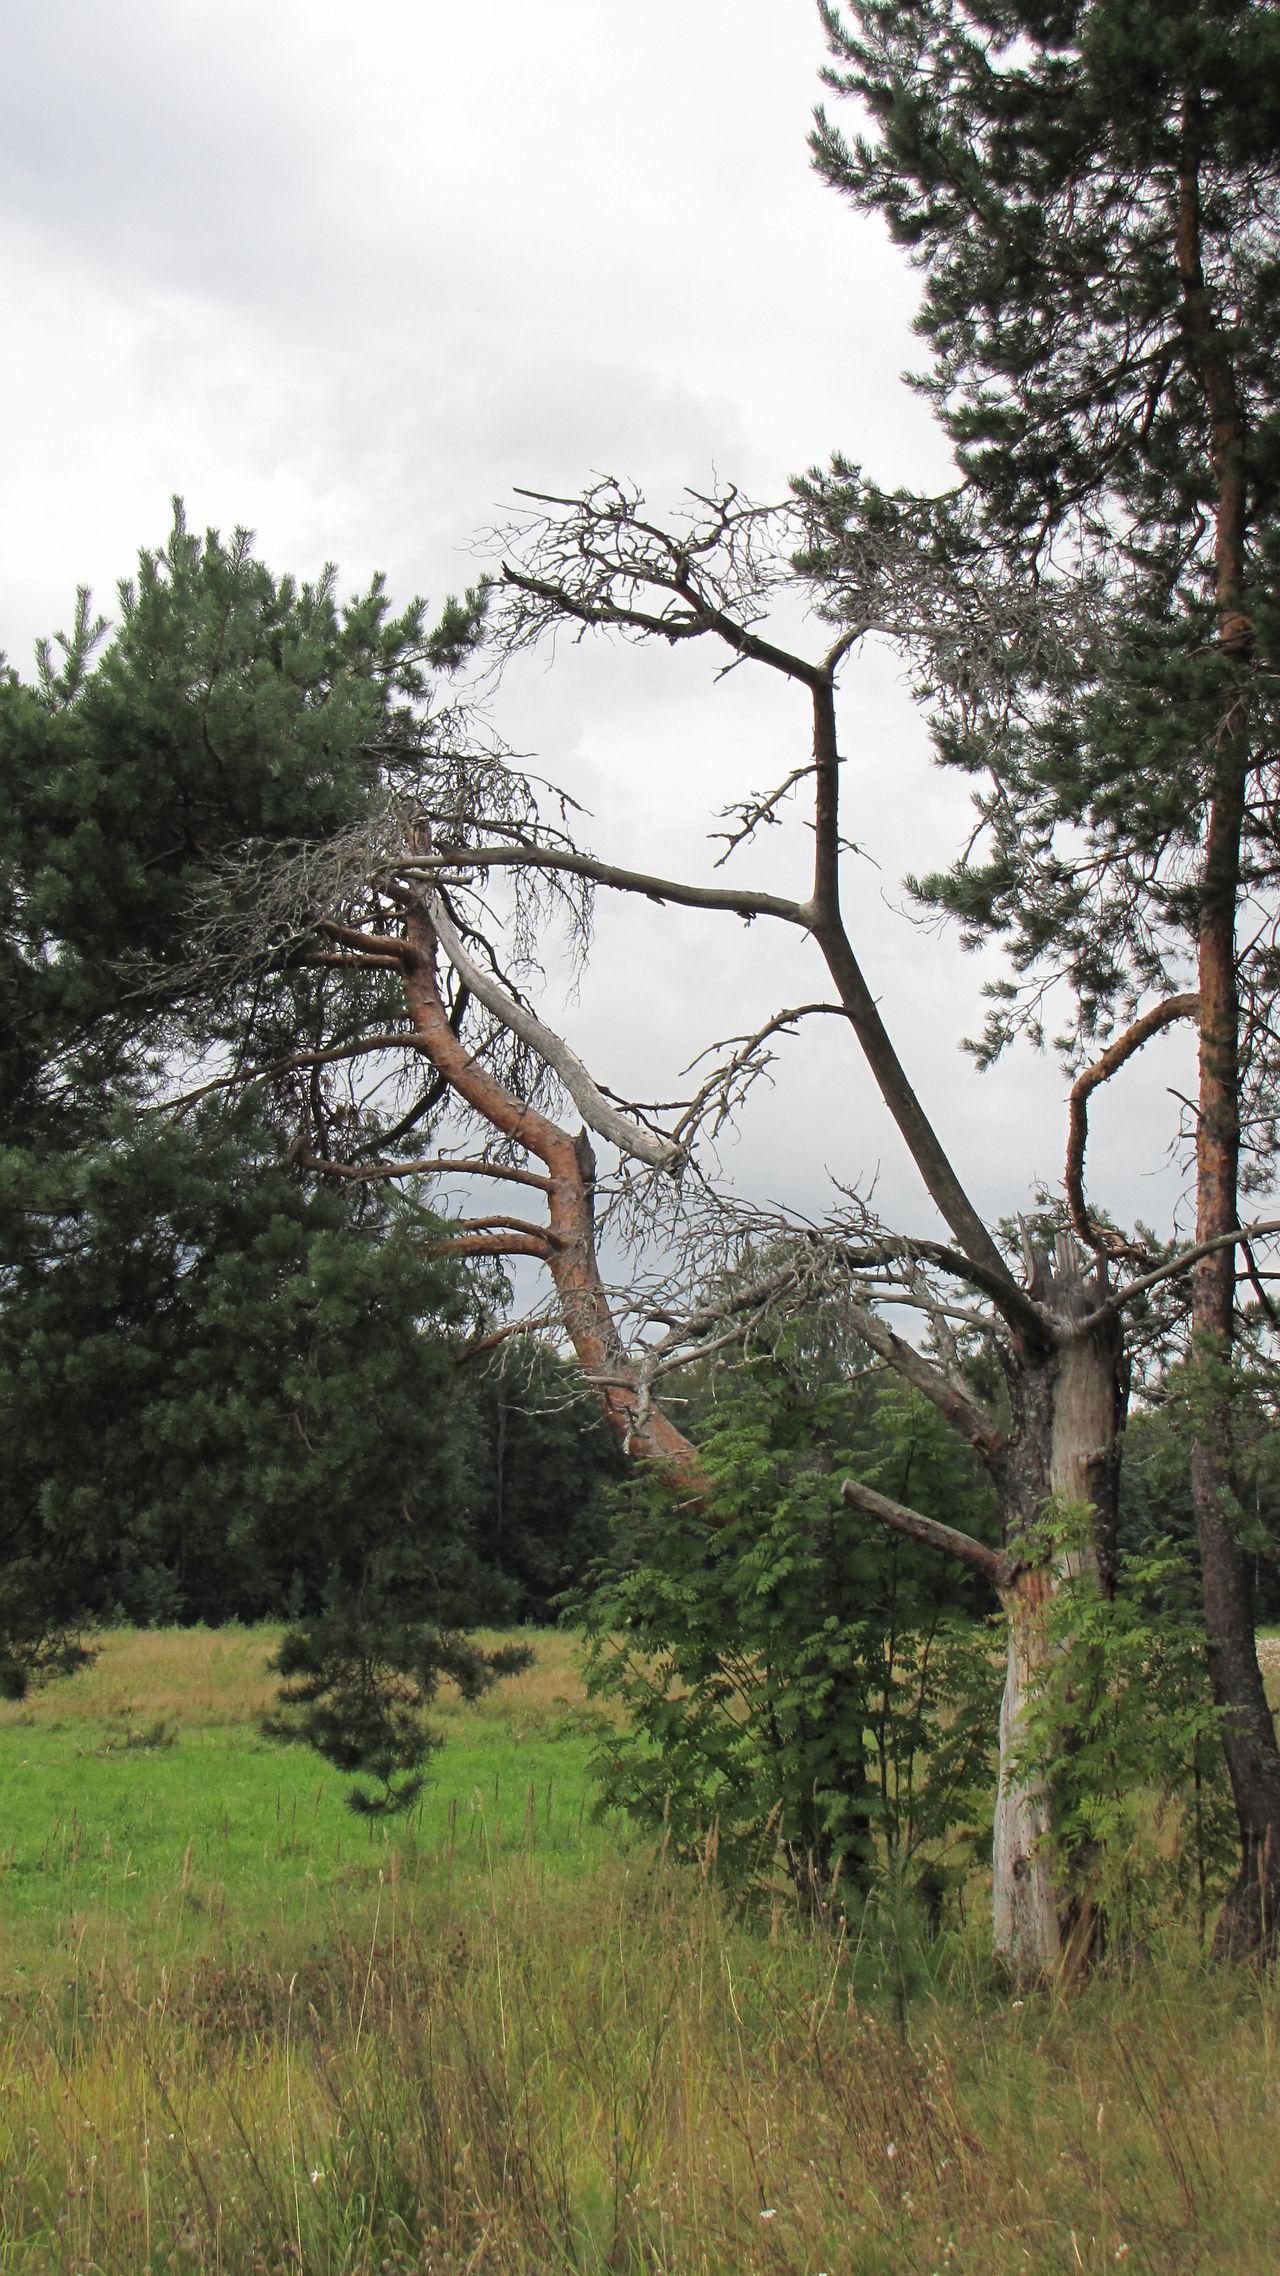 Dead Autumn Dry Snag Cool Green Trees Tree Gray Grey